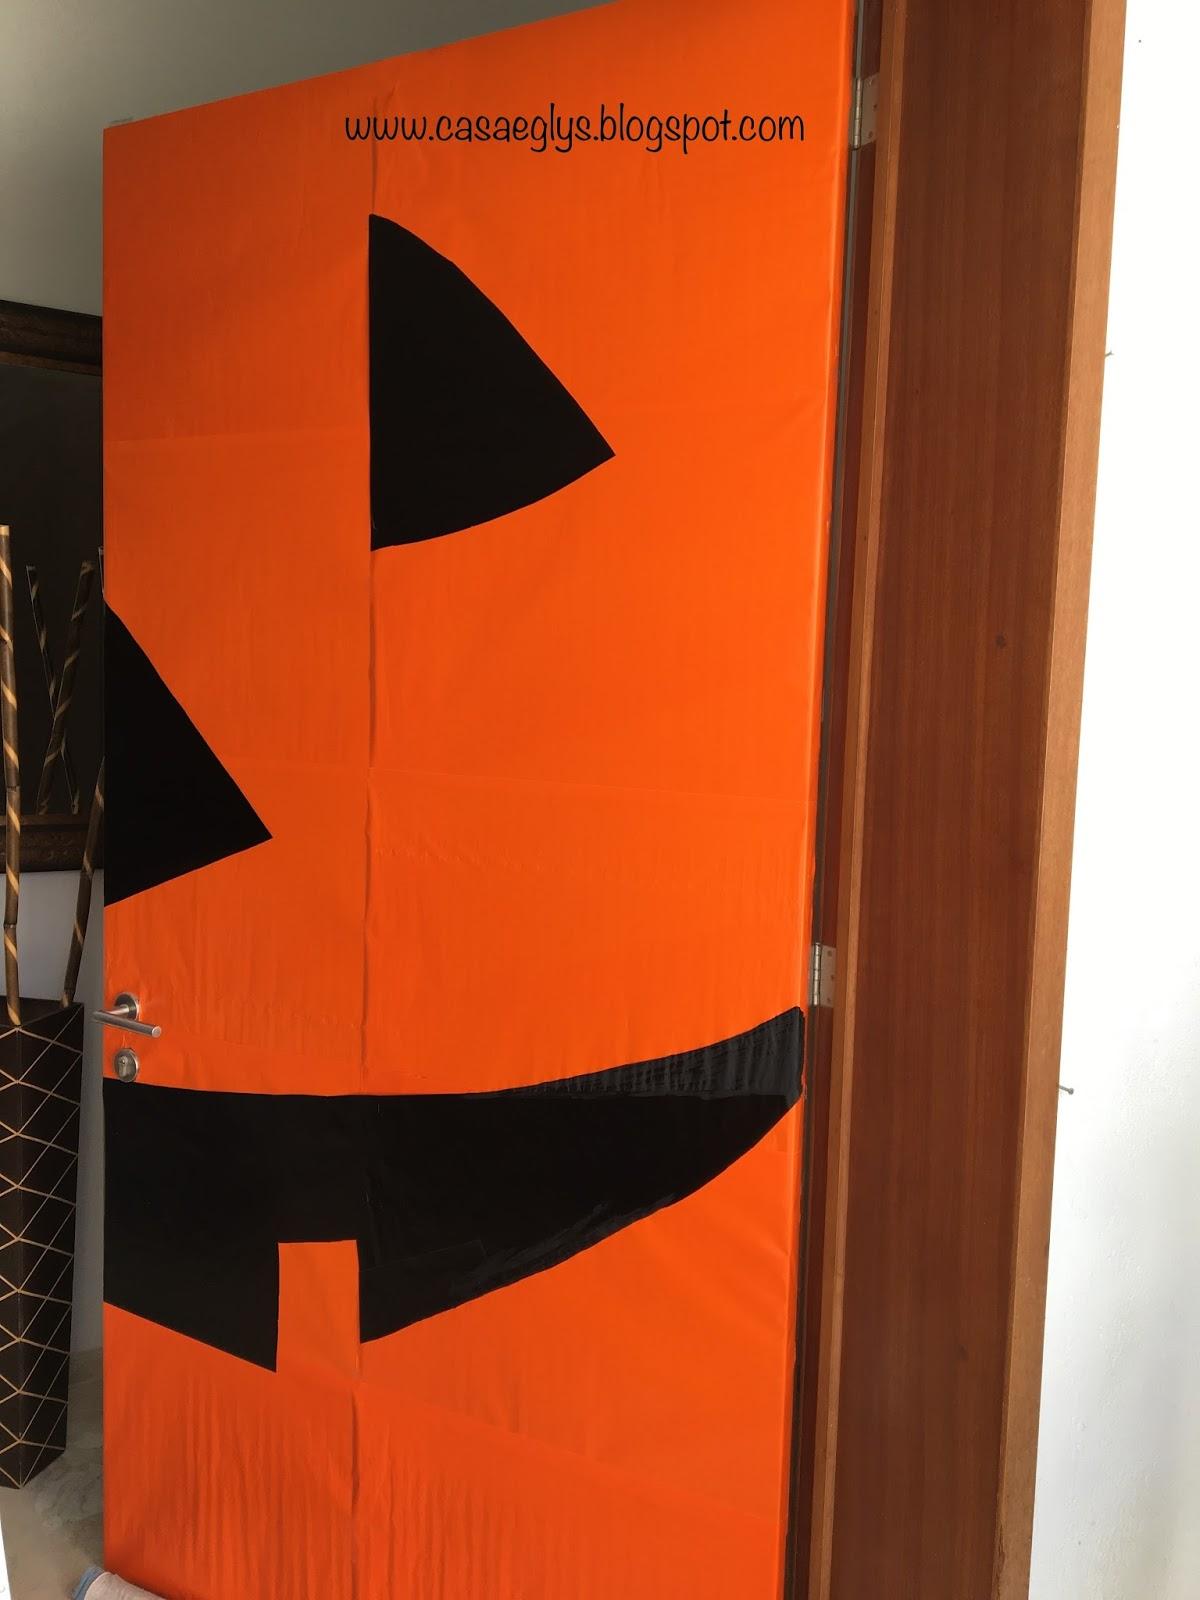 Casa eglys decoraci n puerta halloween - Papel para puertas ...